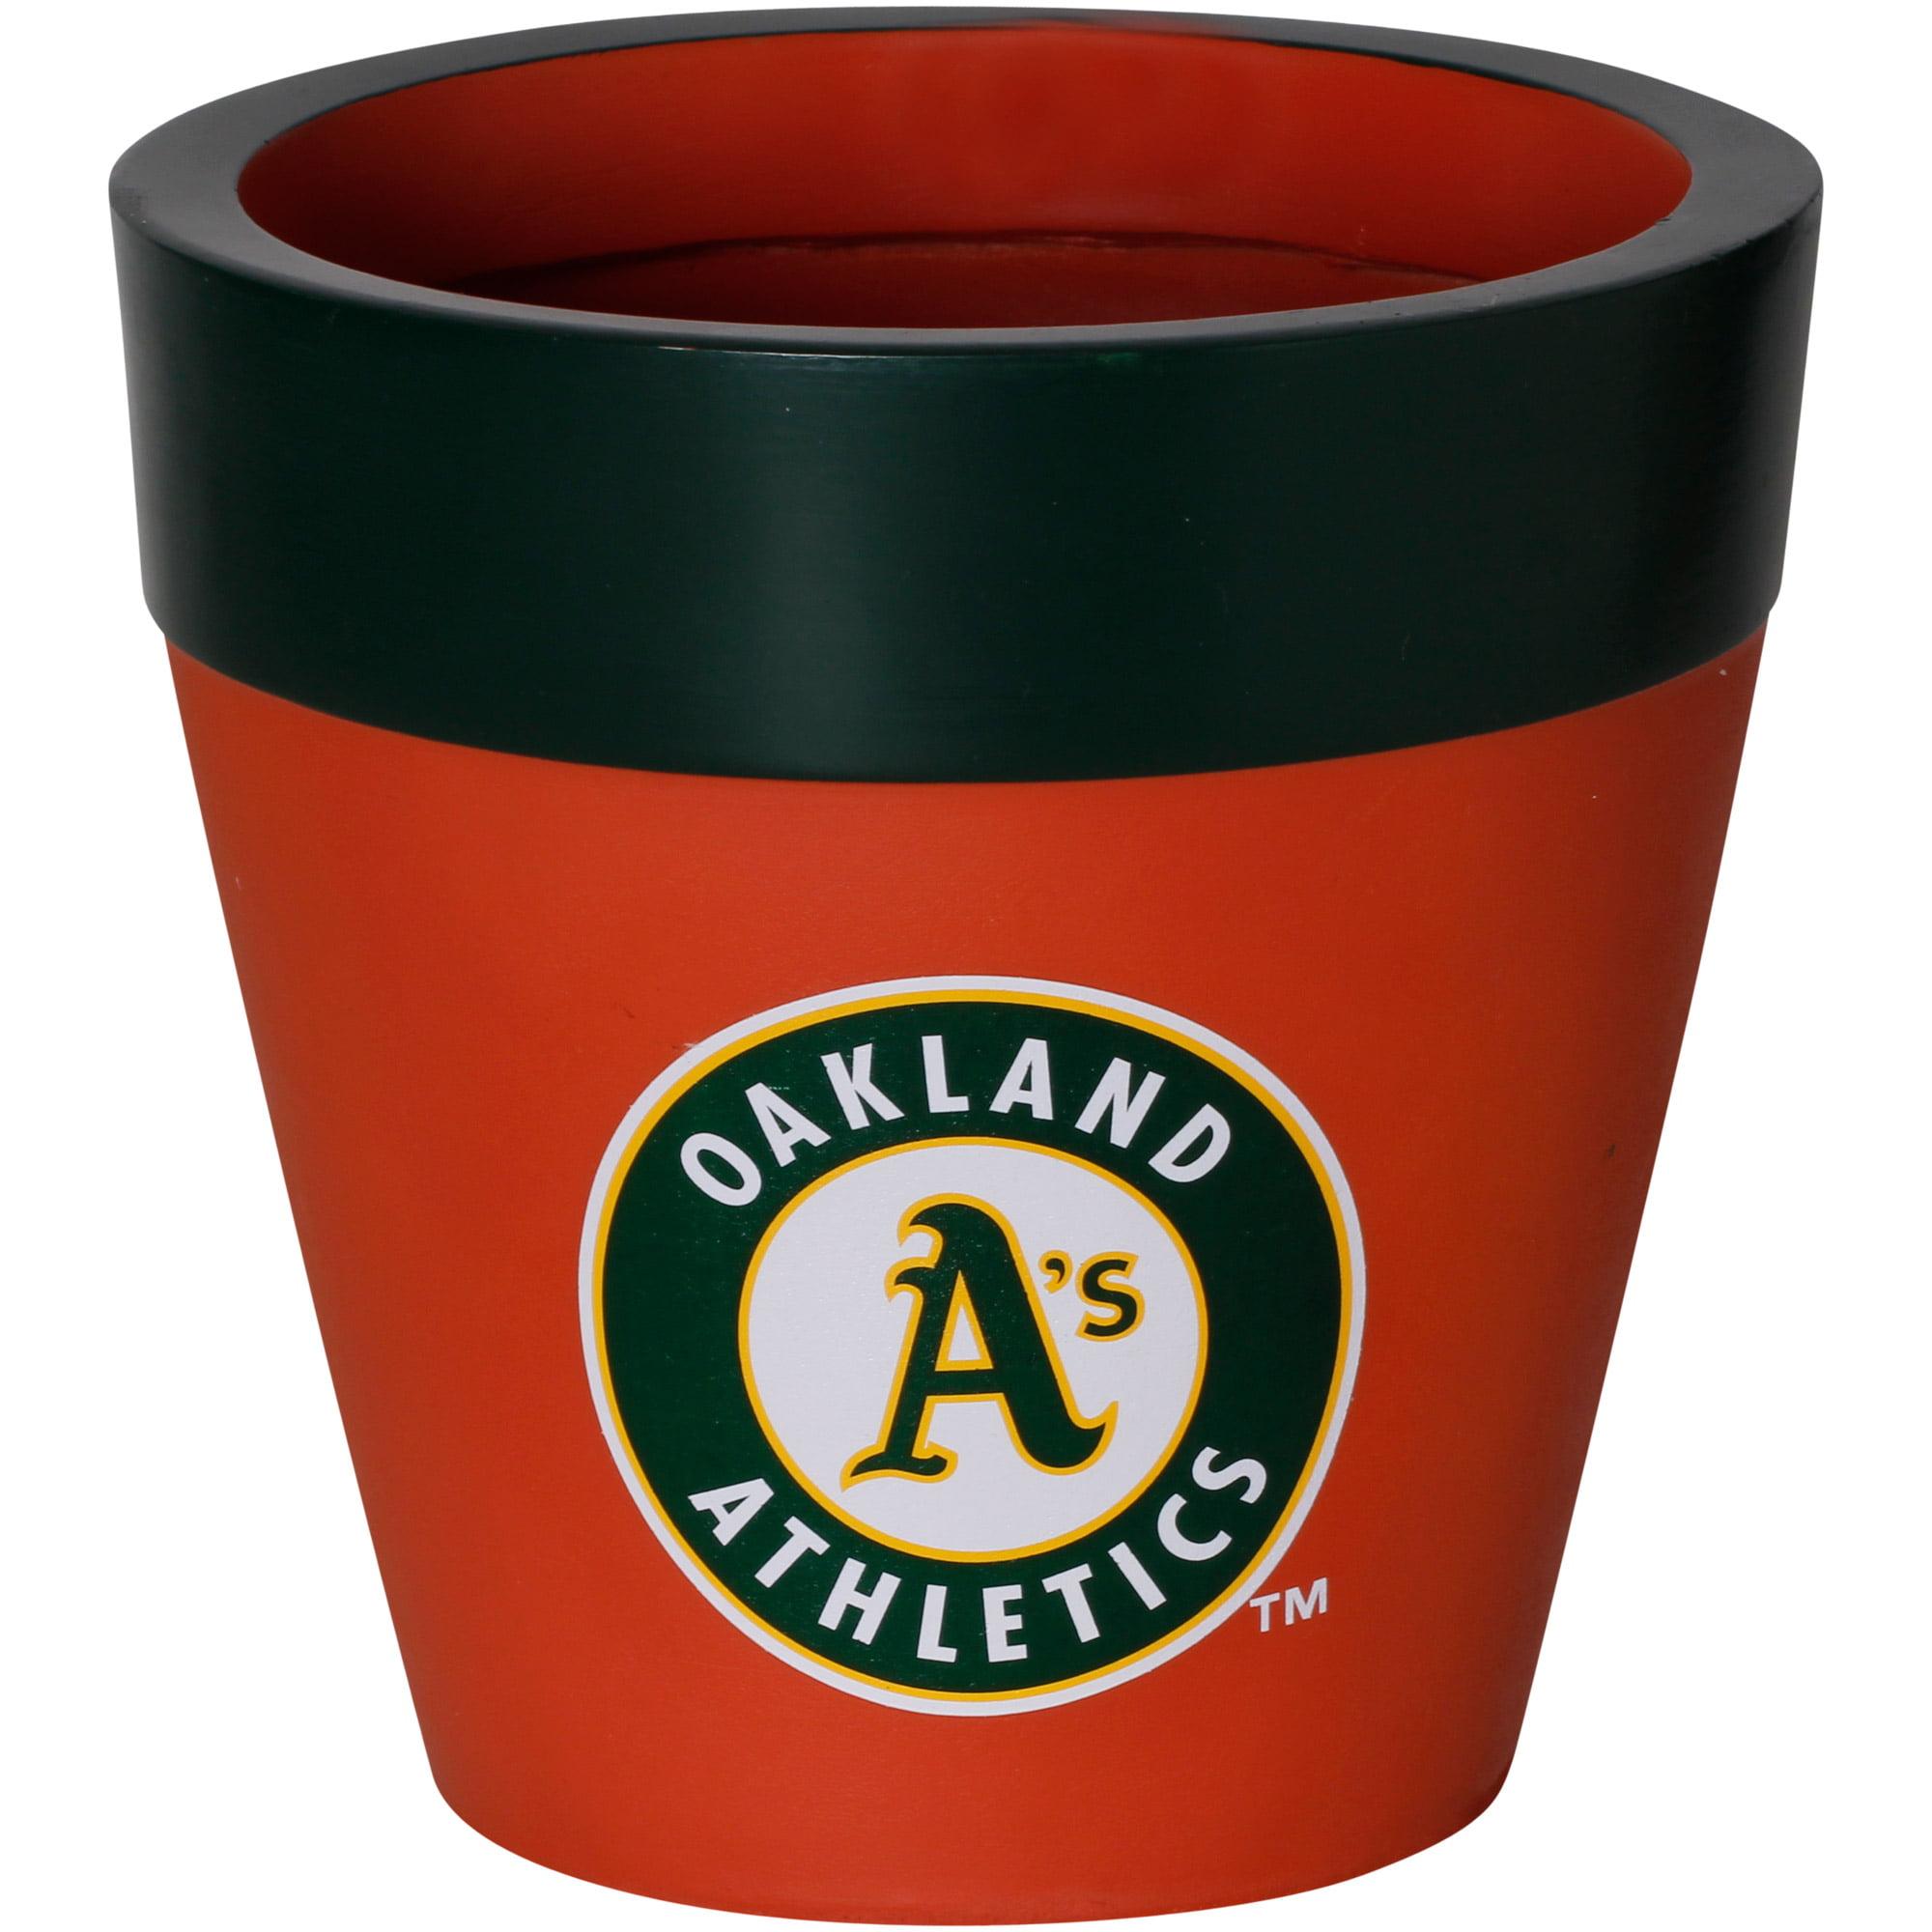 Oakland Athletics Team Planter Flower Pot - No Size